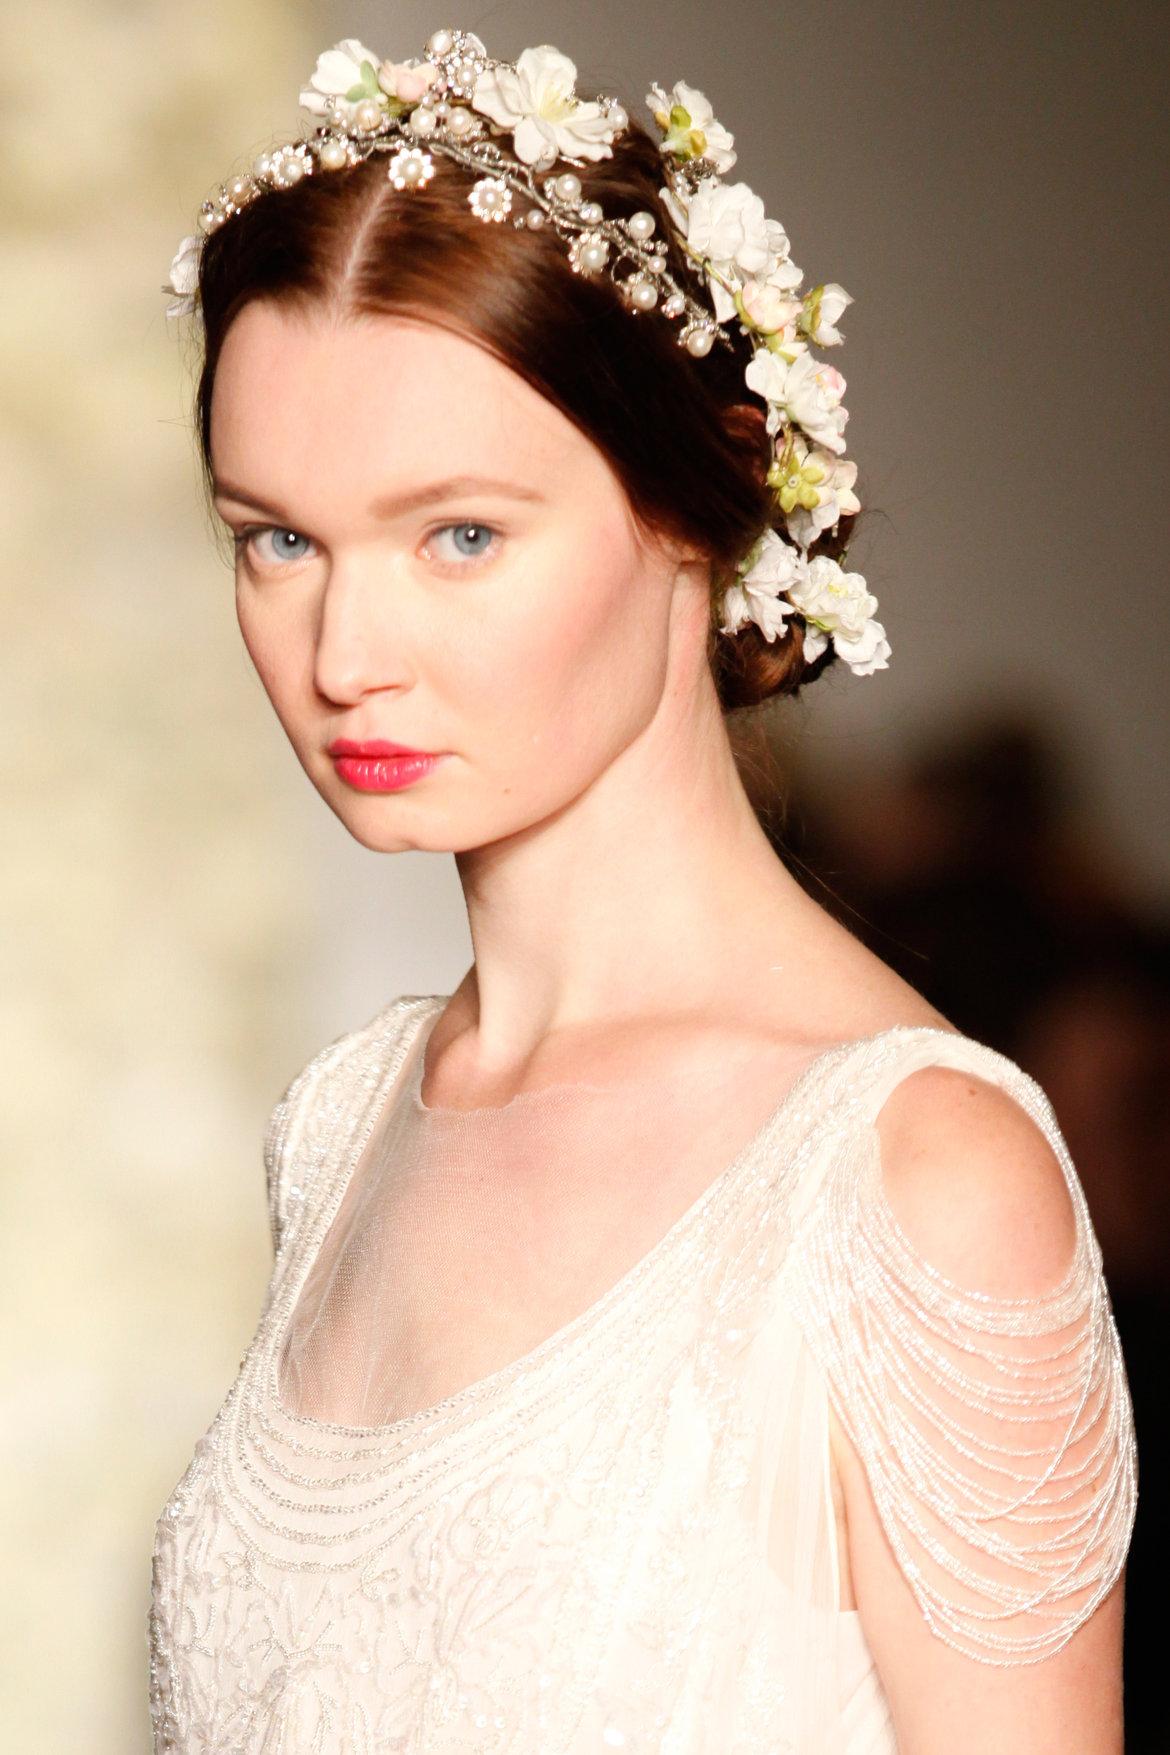 Wondrous Gorgeous Braided Wedding Hairstyles Bridalguide Hairstyles For Women Draintrainus